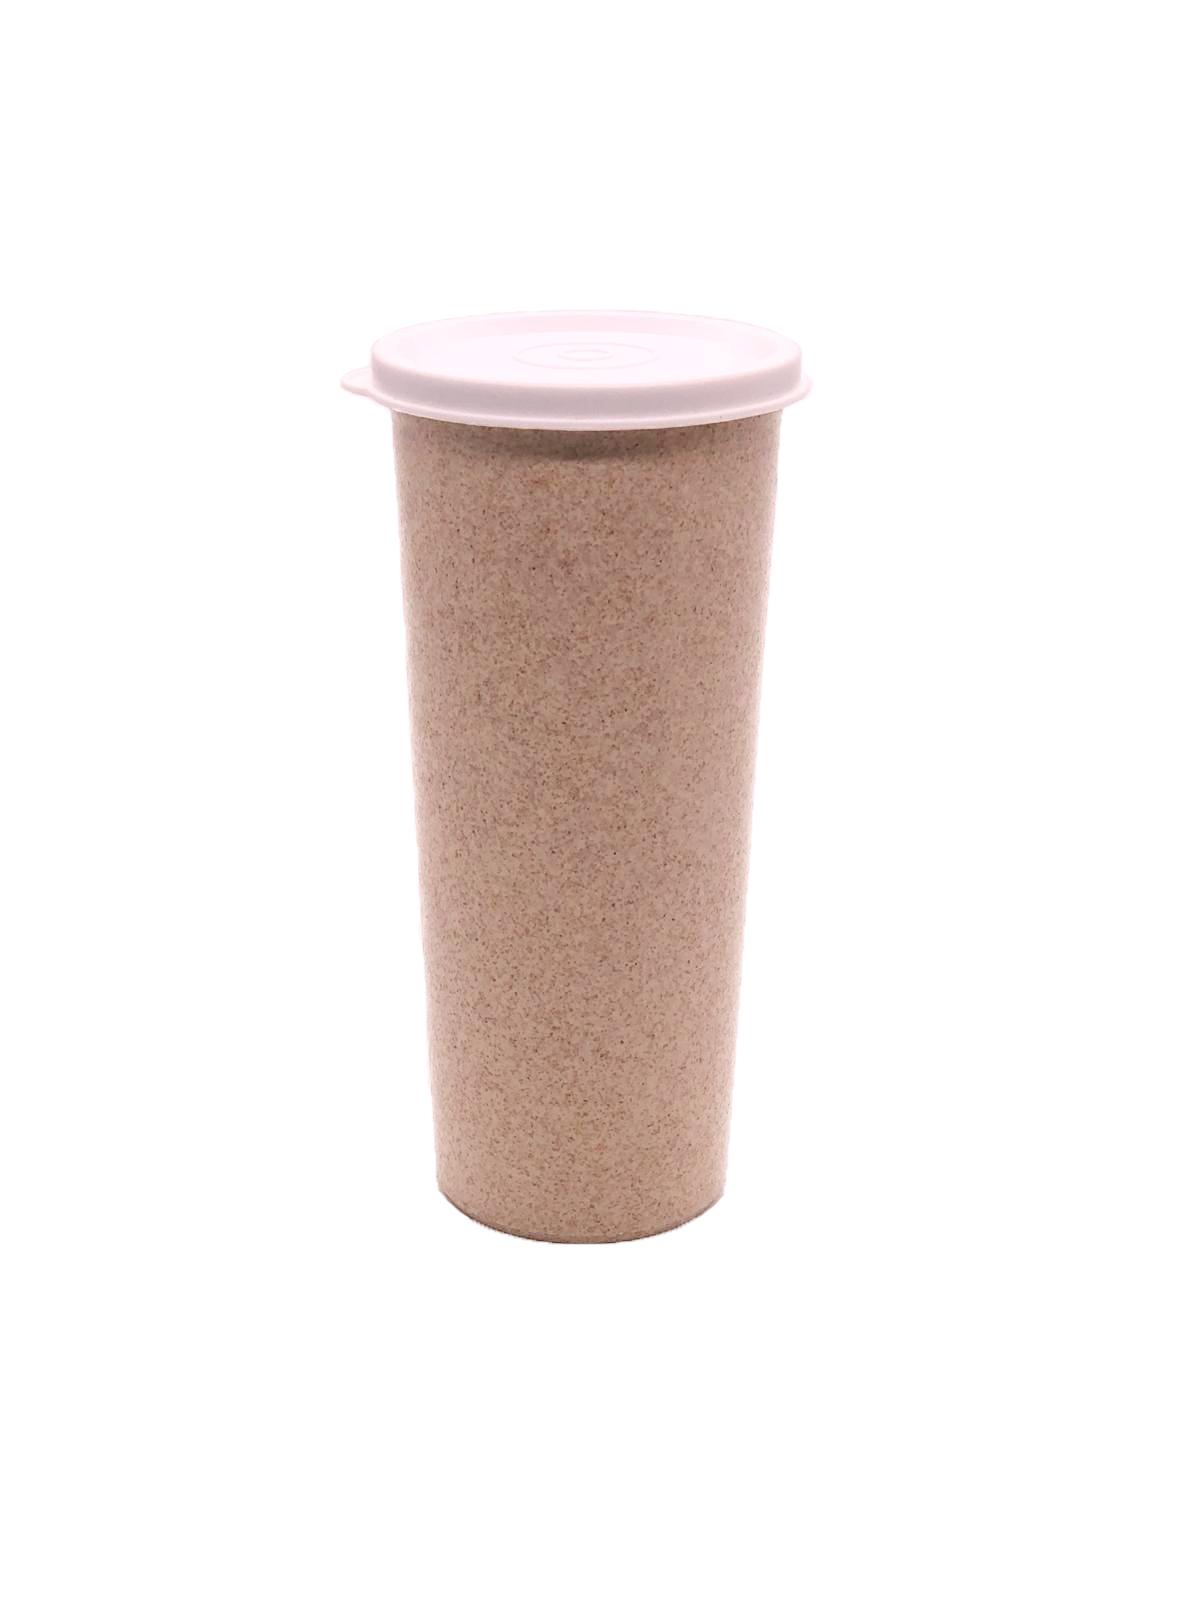 custom wheat straw tumbler